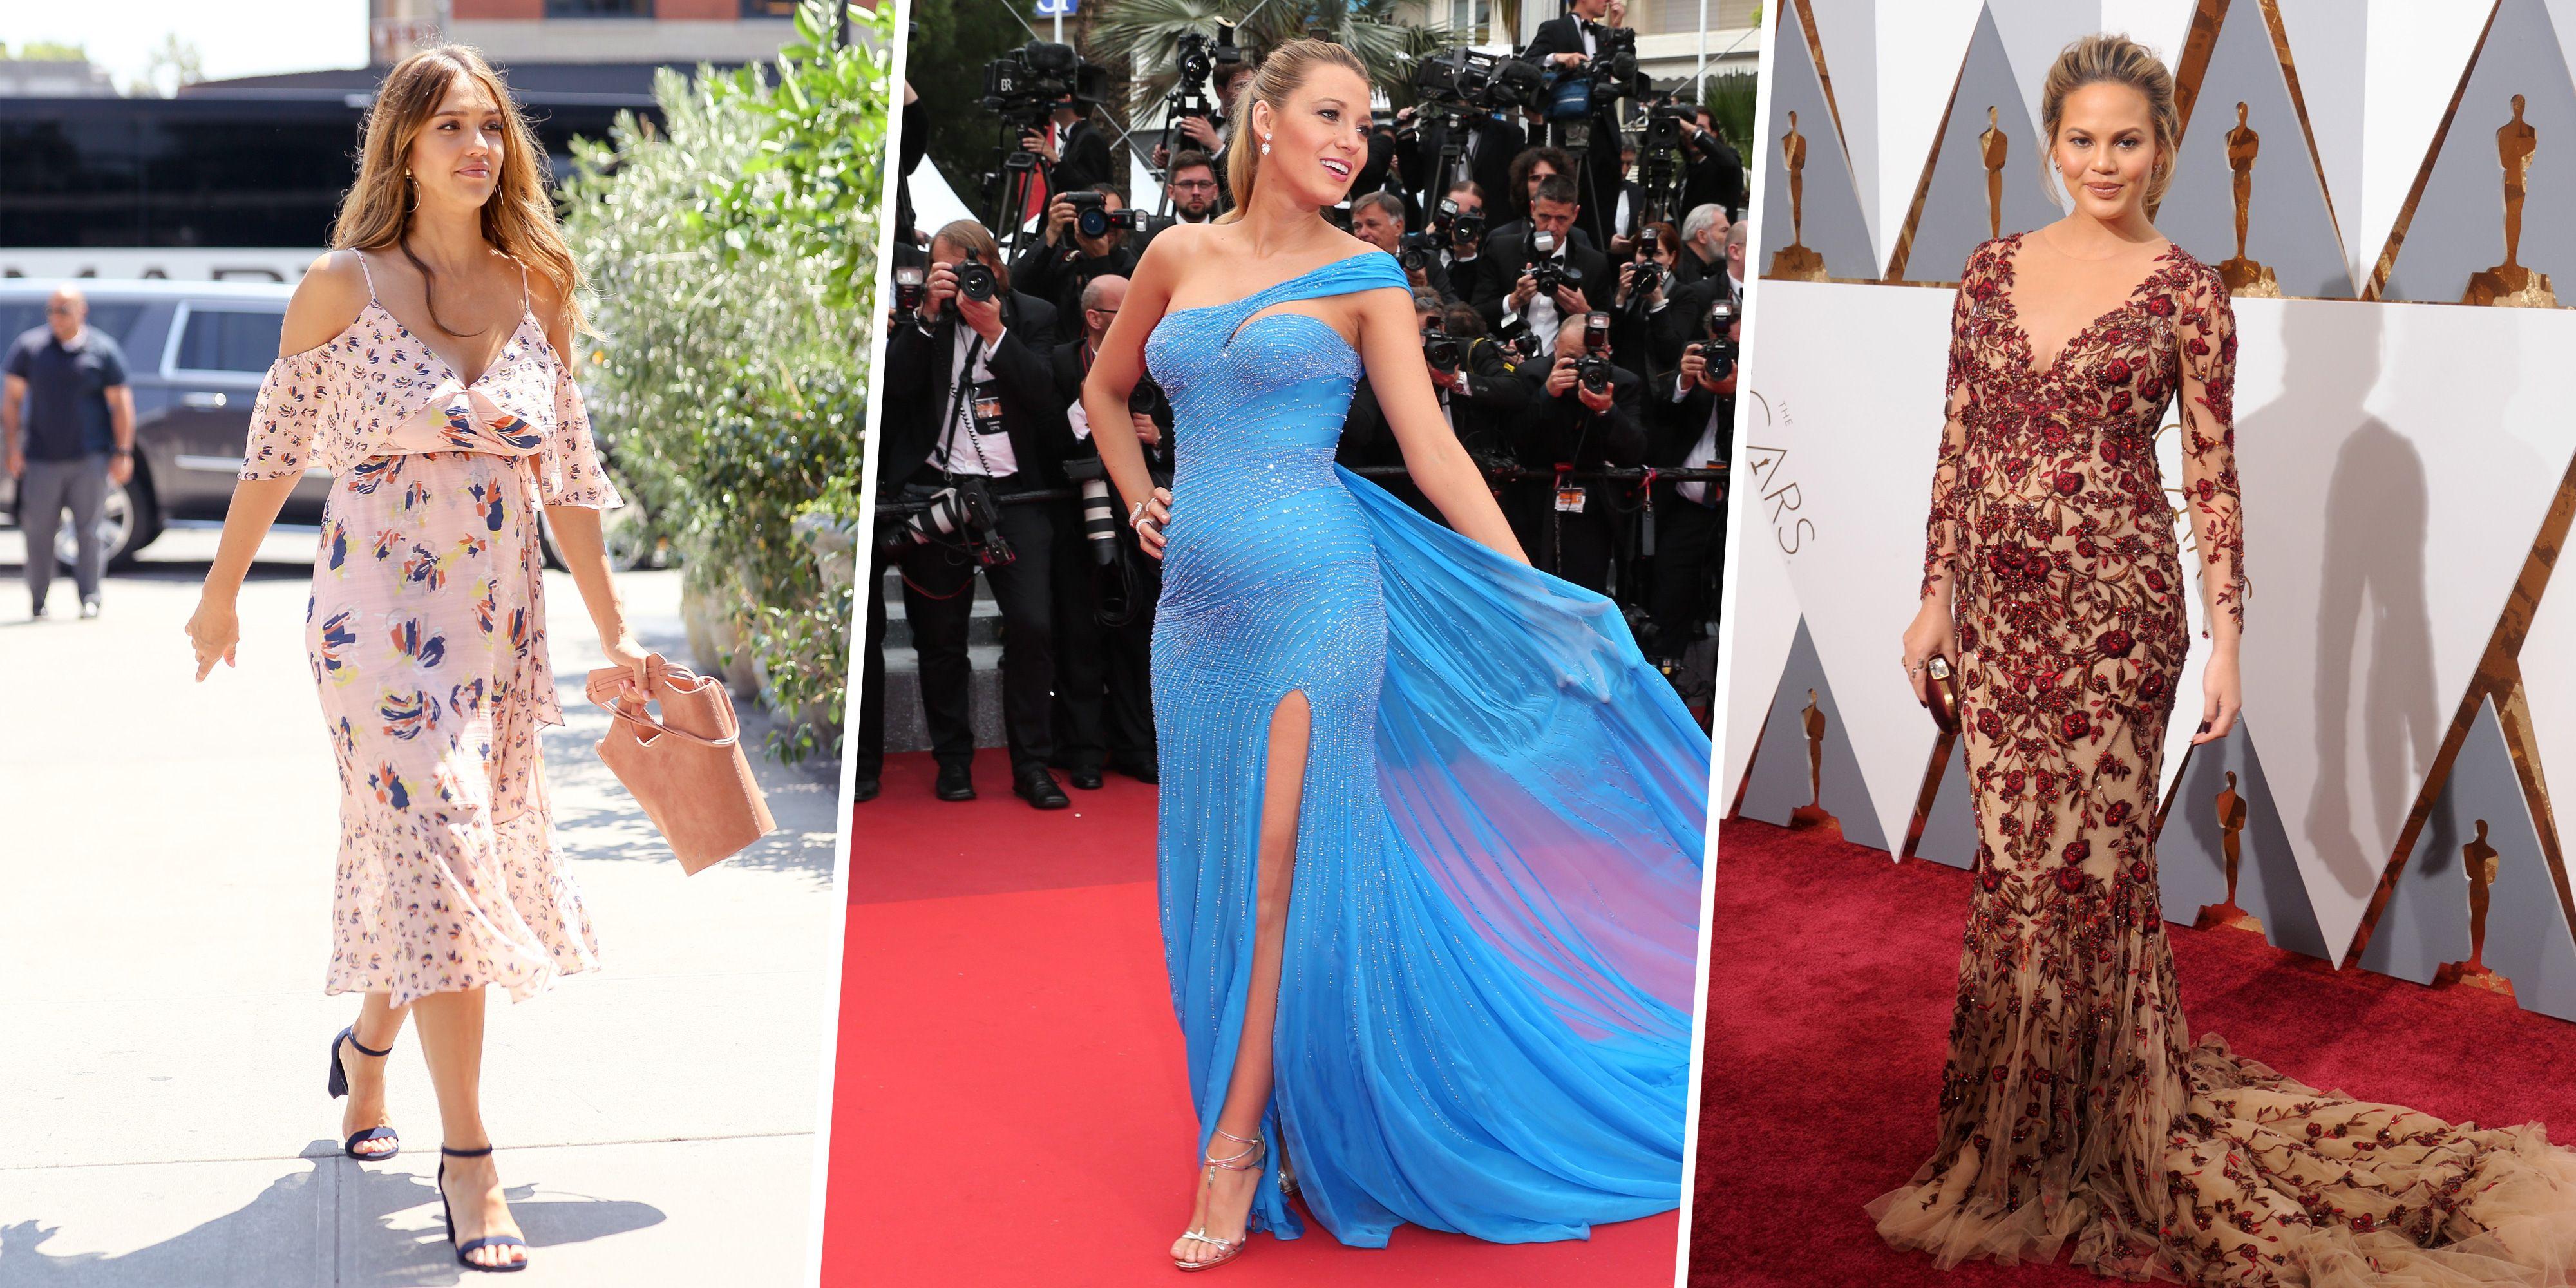 902b8d44d9c Pregnant Celebrities Best Looks - Celebrity Maternity Fashion